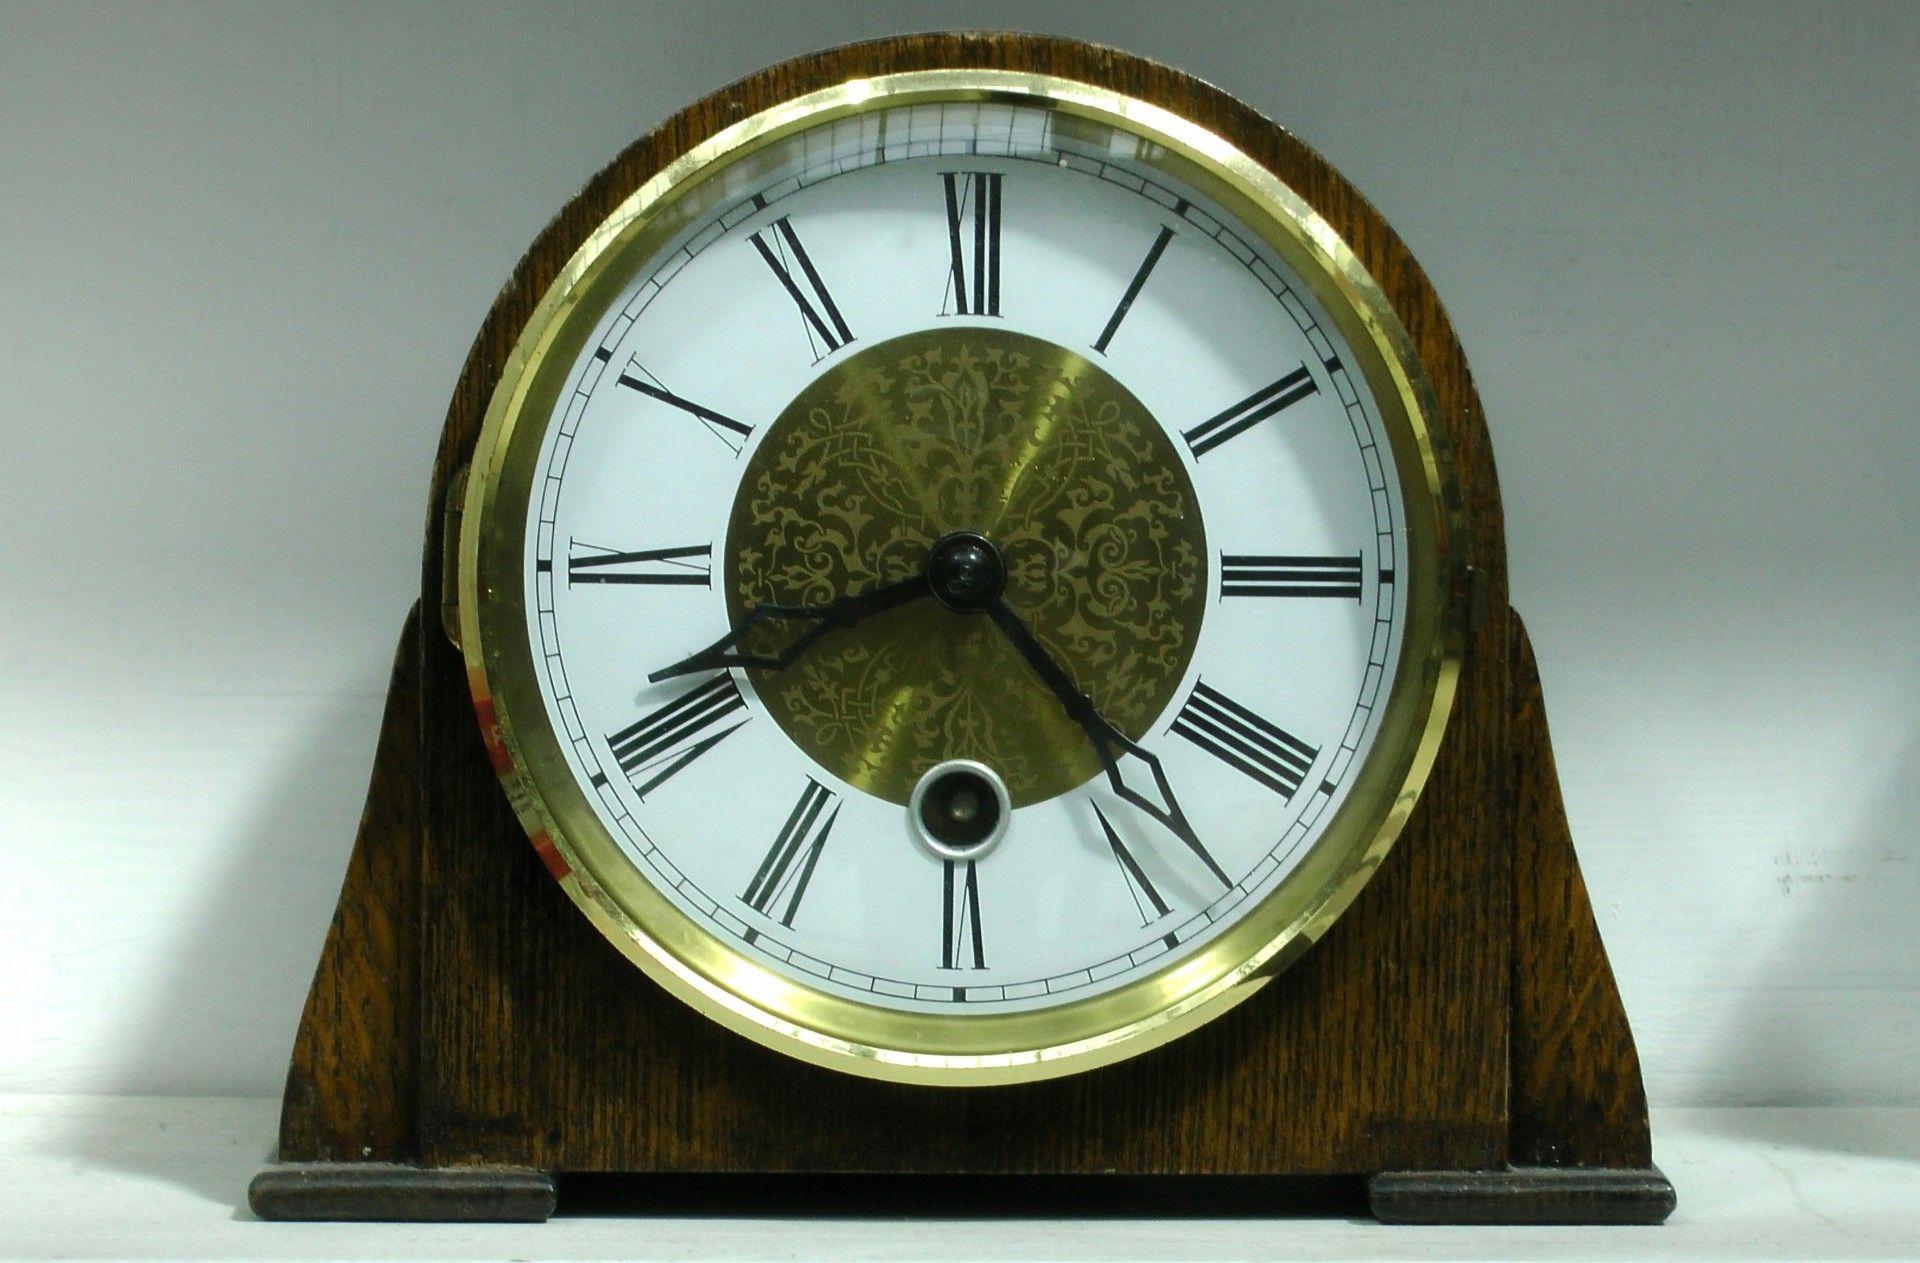 Antike uhr wallpaper  beautiful antique clock wallpaper download full free high ...